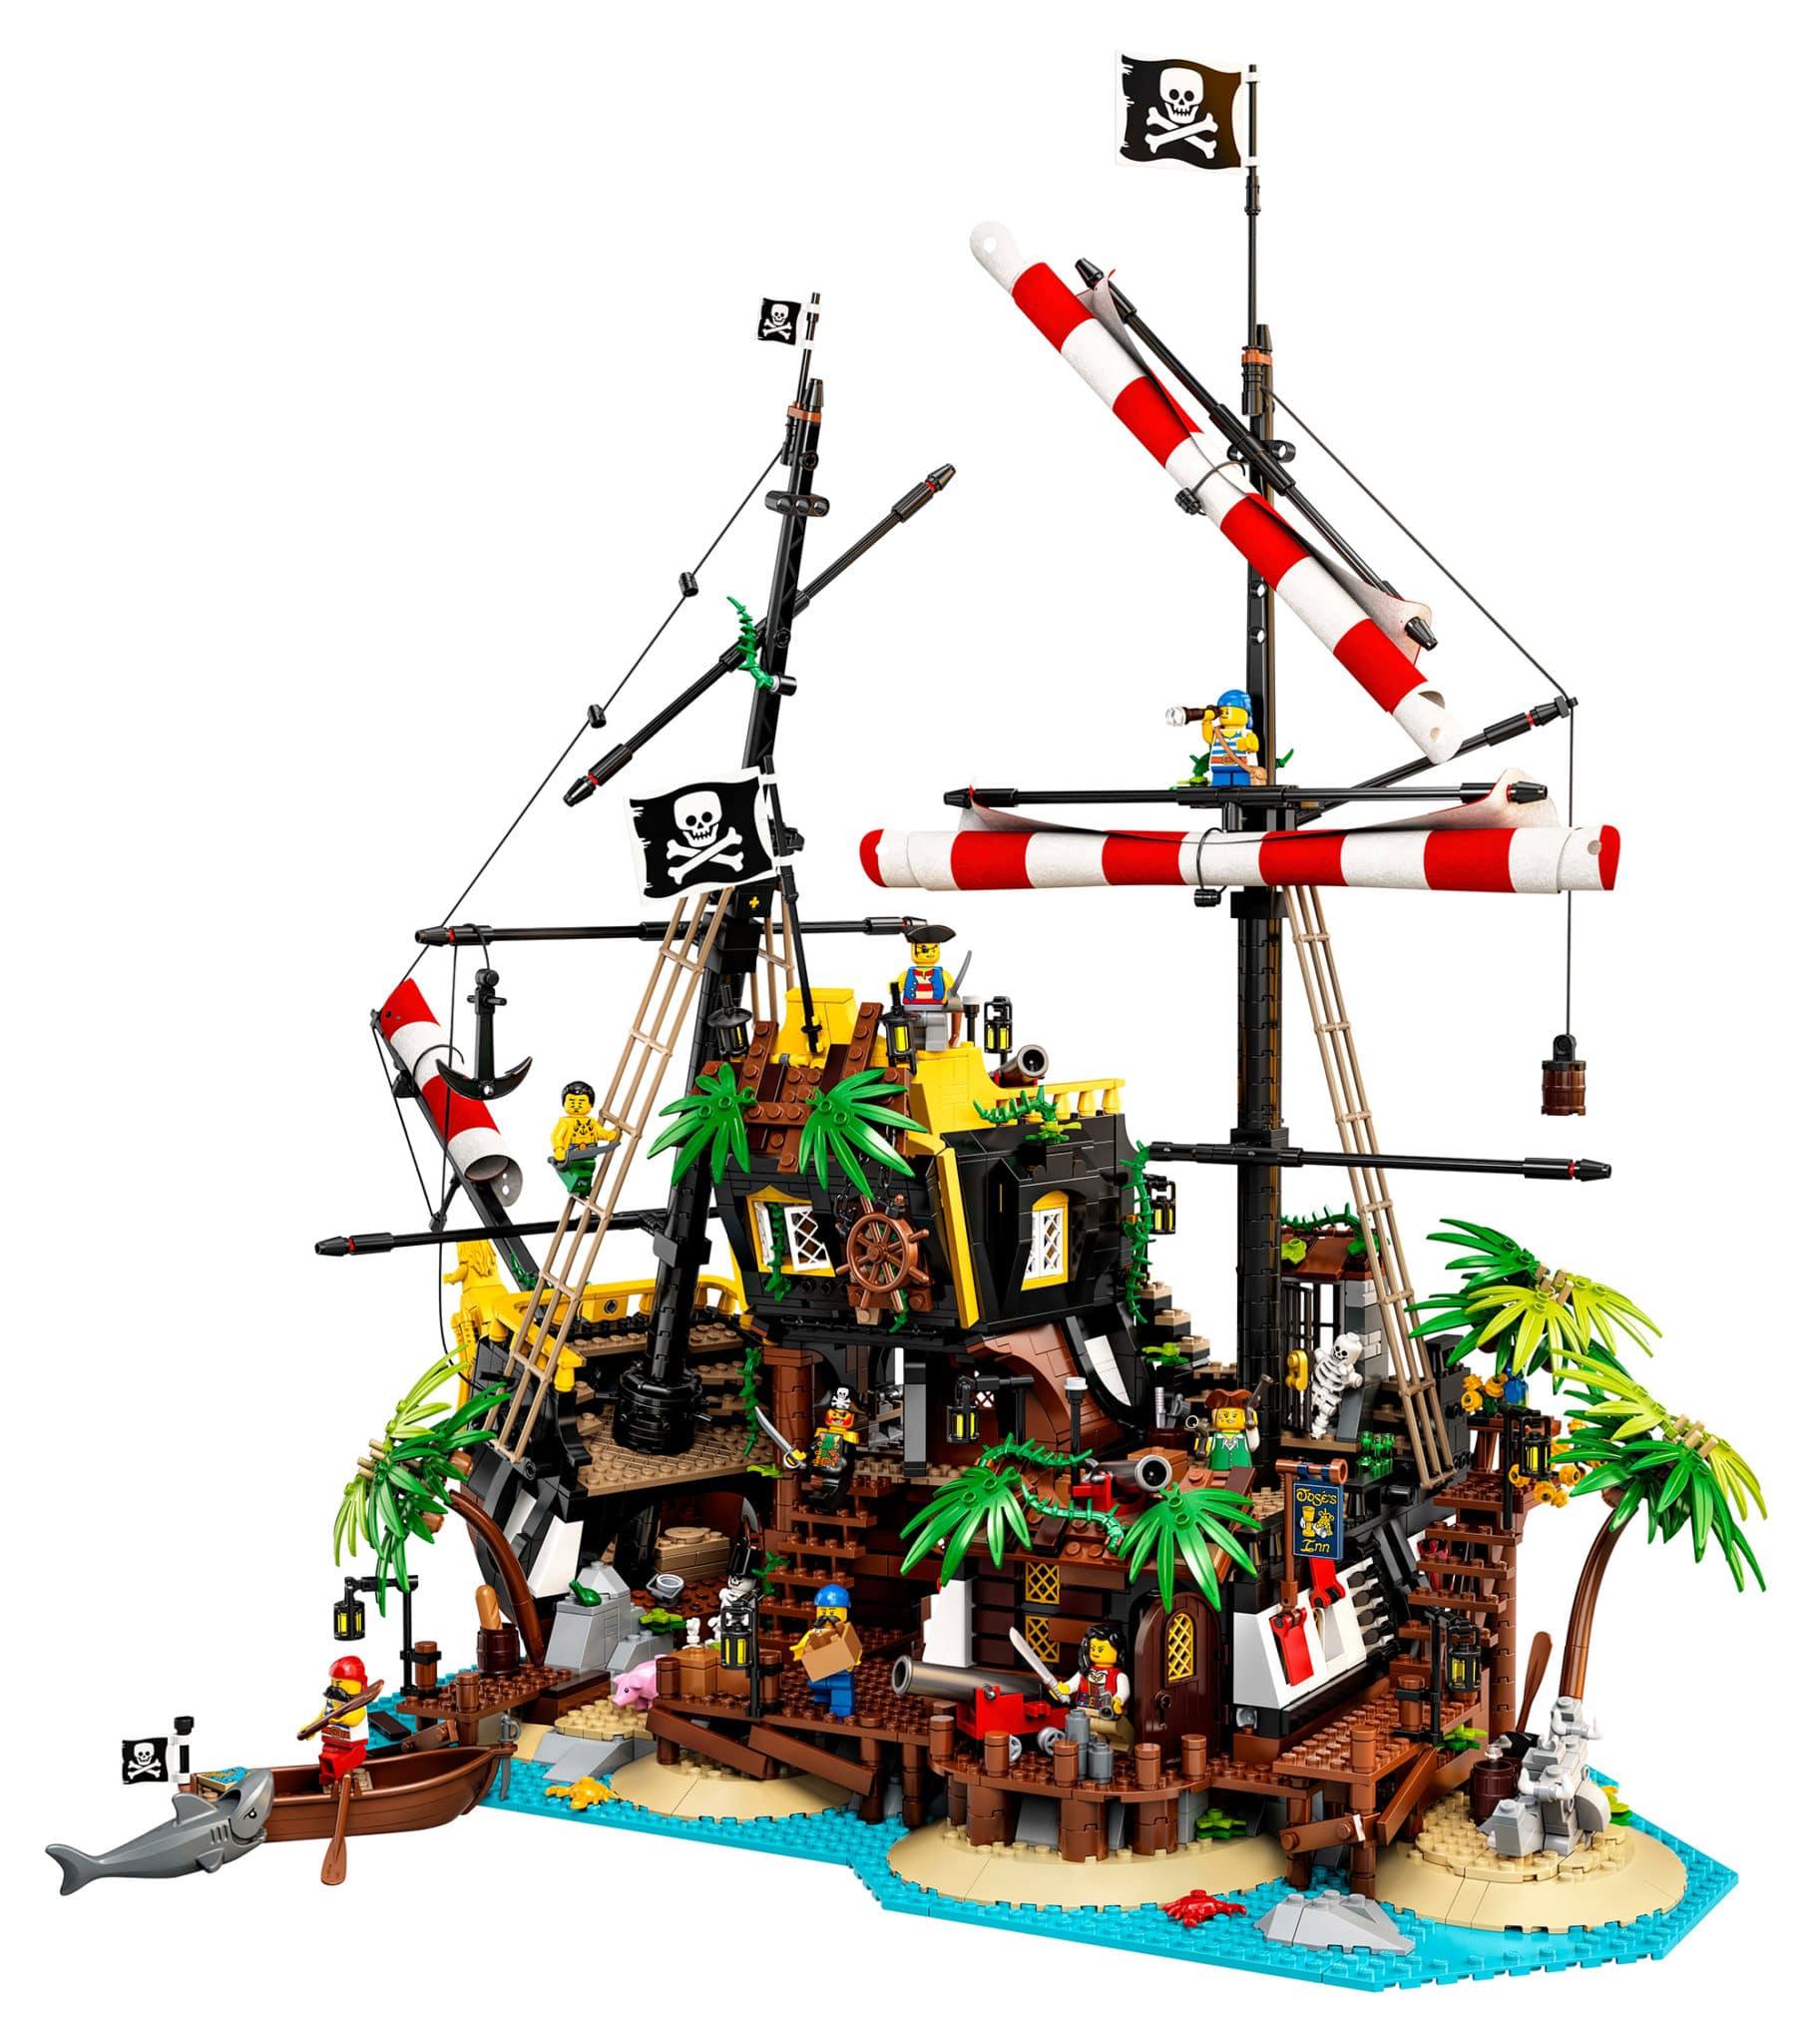 LEGO 21322 Pirate of Barracuda Bay